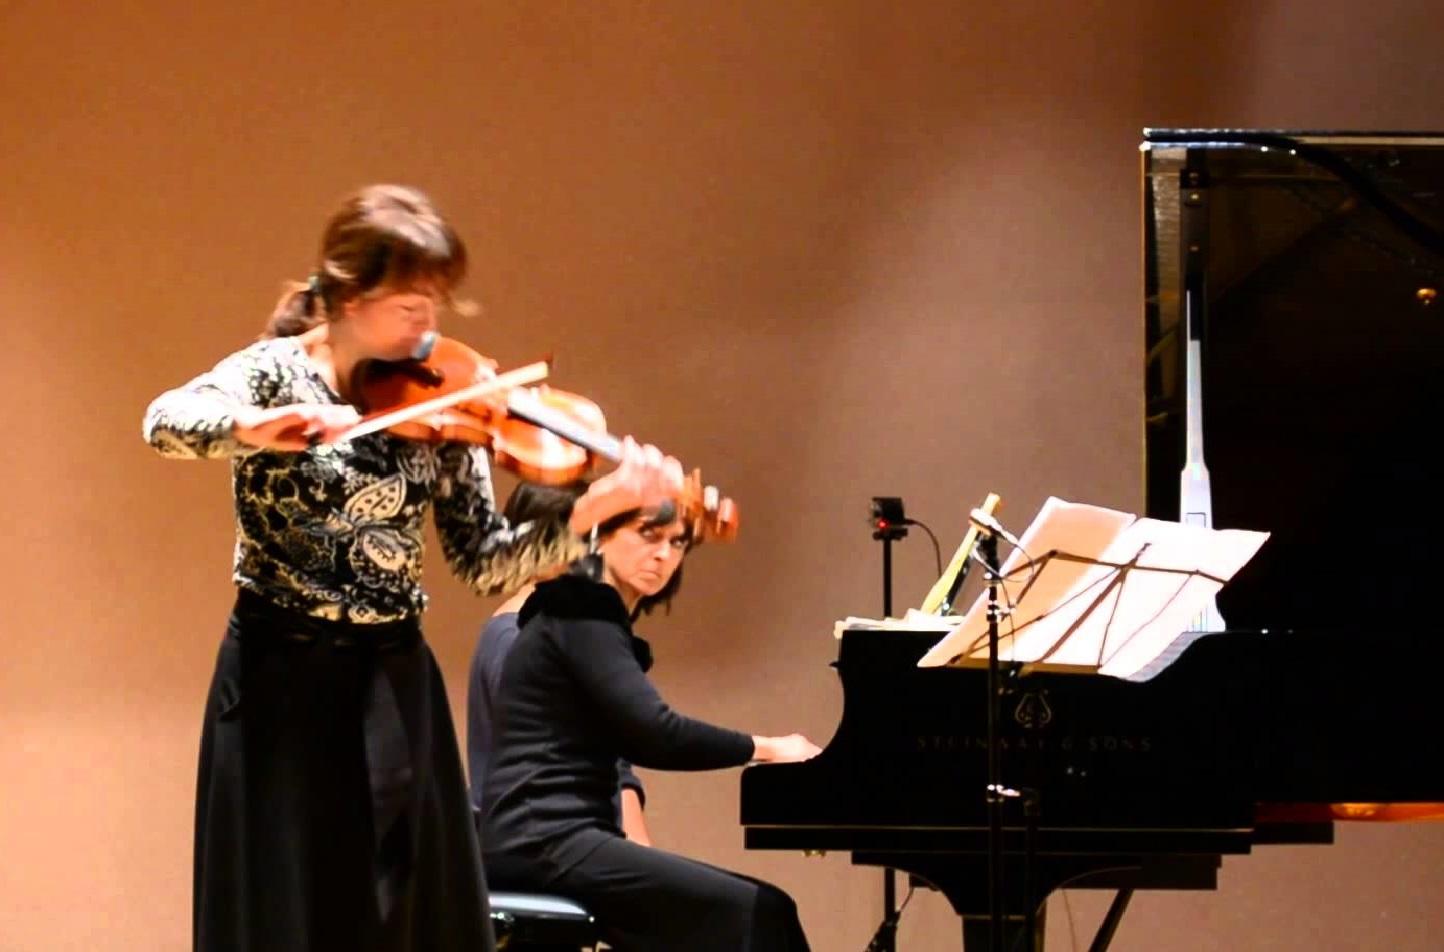 Irene Cardo al violino e Caterina Vivarelli al pianoforte